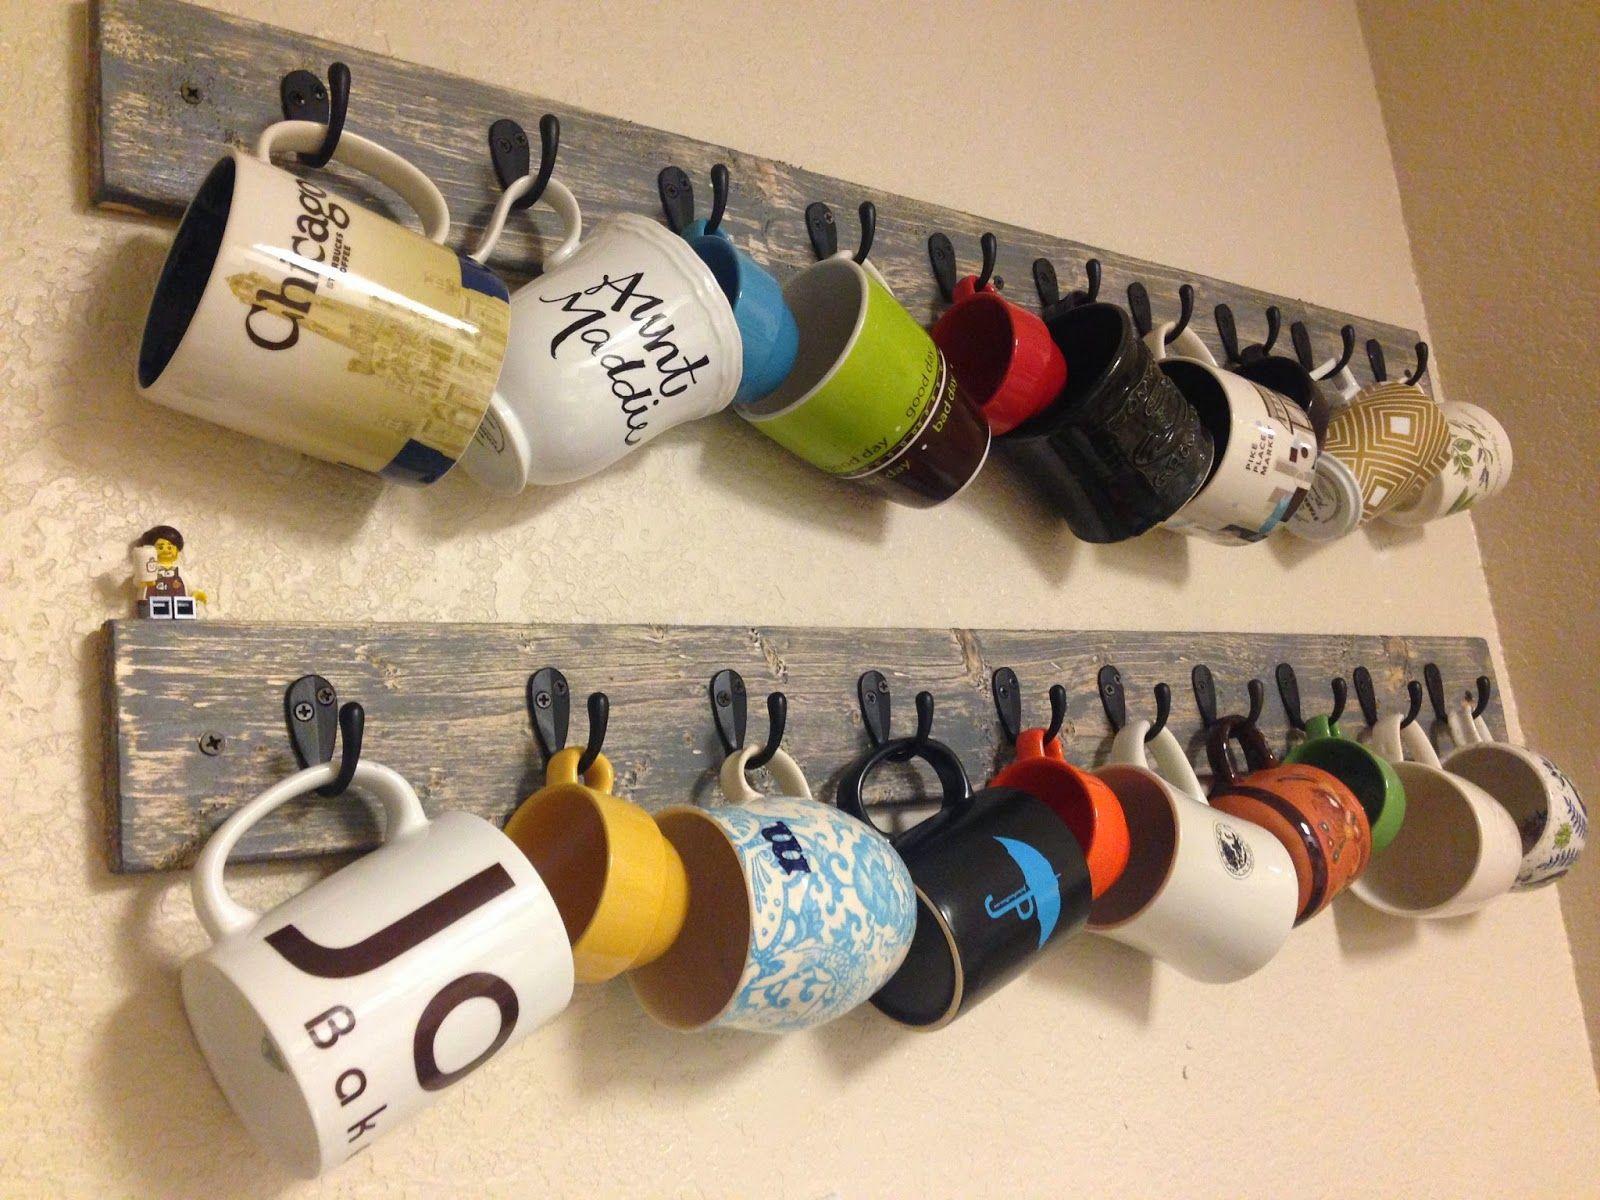 Coffee Mug Racks Apartment Kitchen Organization Home Diy Sweet Home